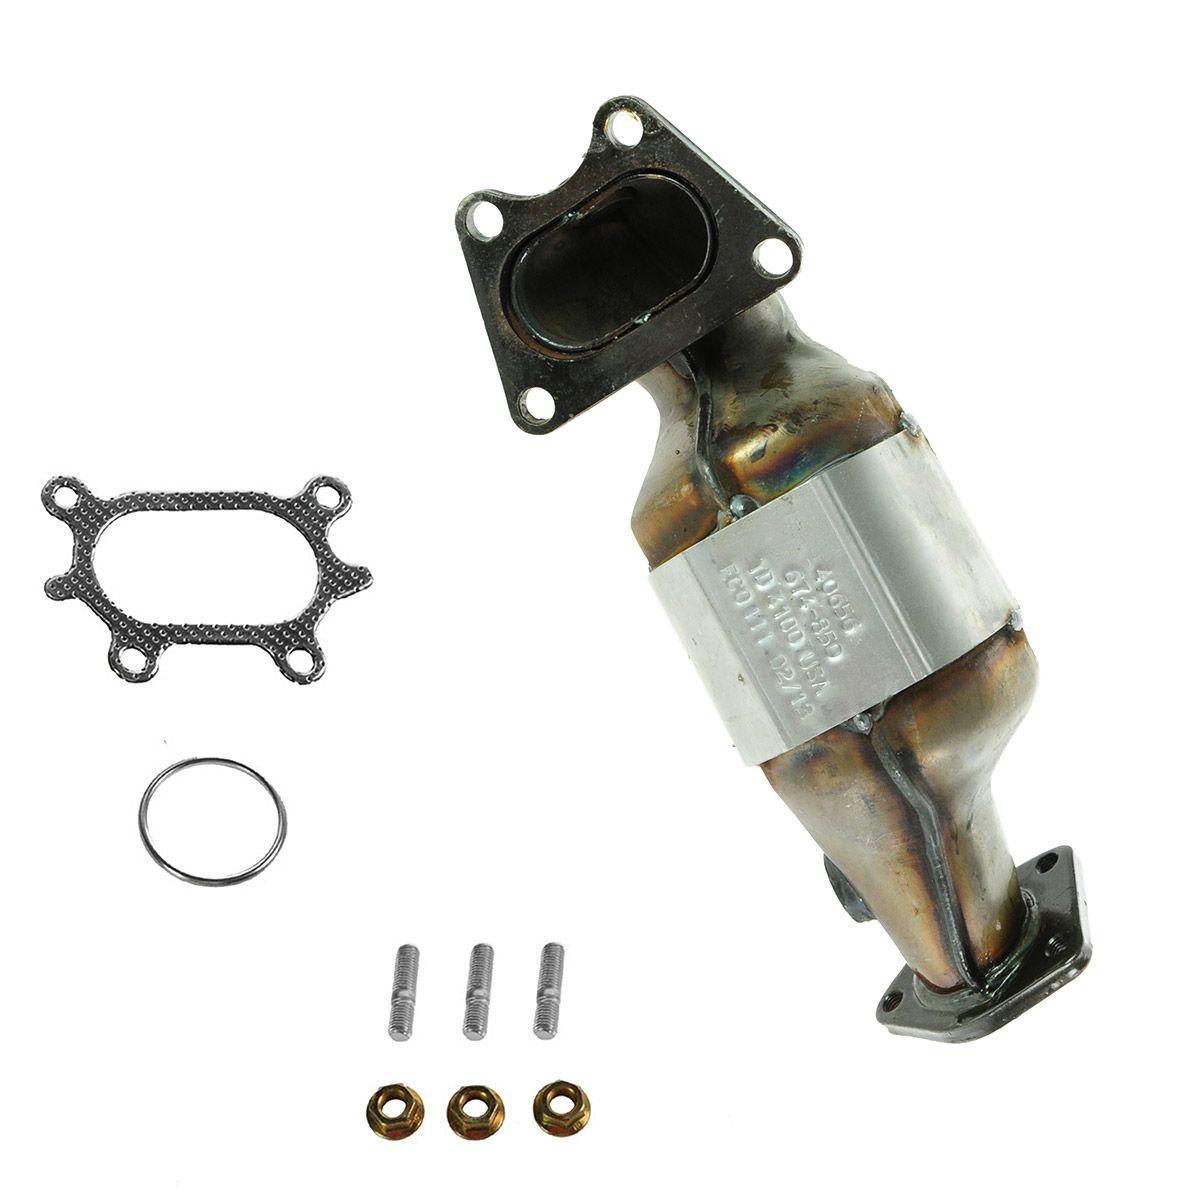 Dorman Exhaust Manifold W/ Catalytic Converter LH For